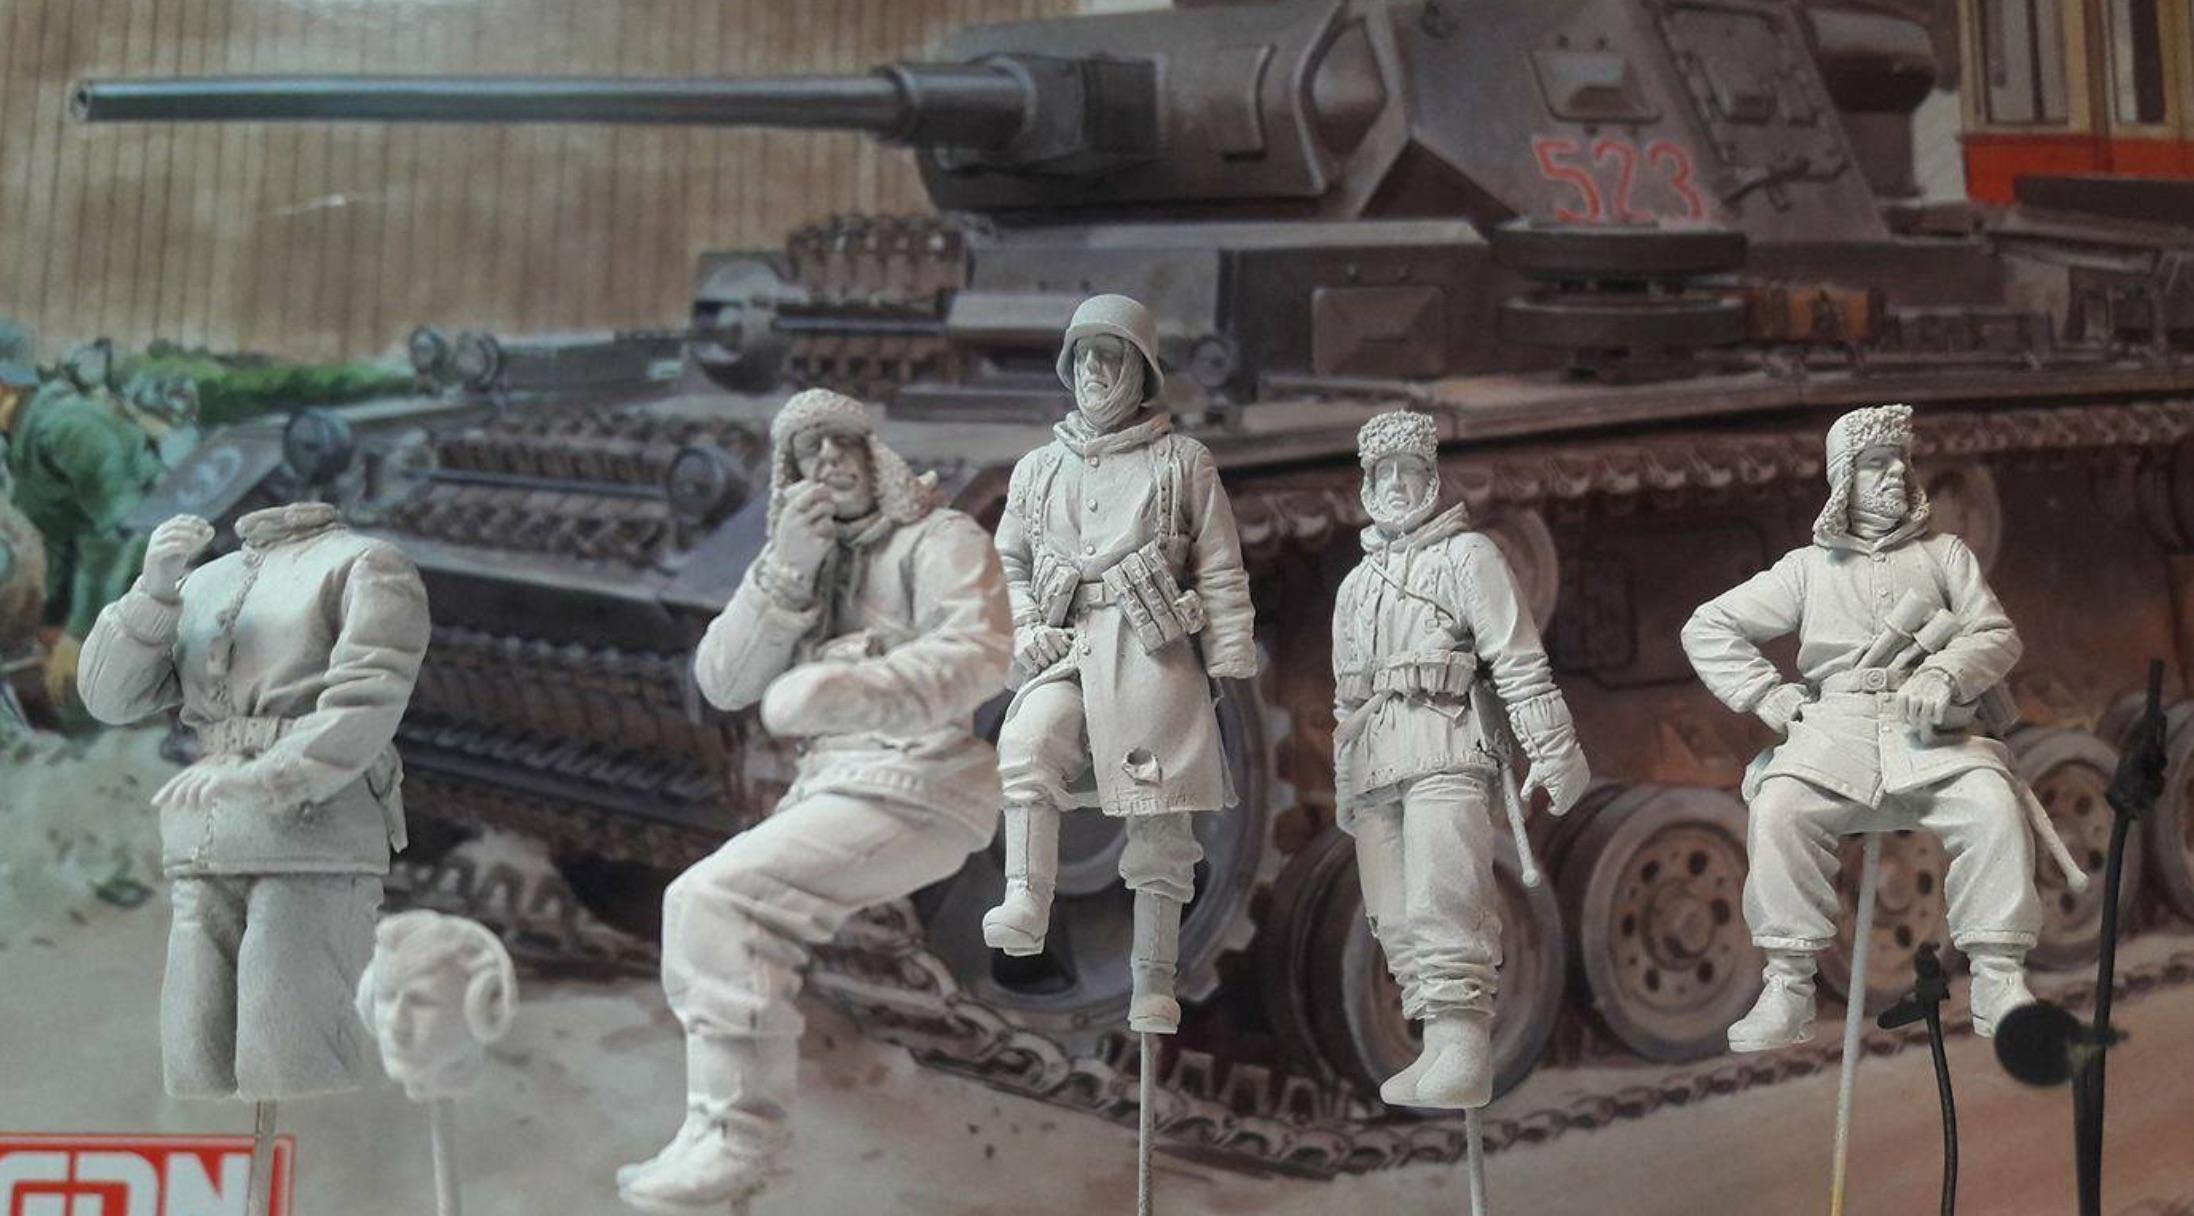 Pz.Kpfw.III Ausf.J - Dragon 673836FigsBasicLayer